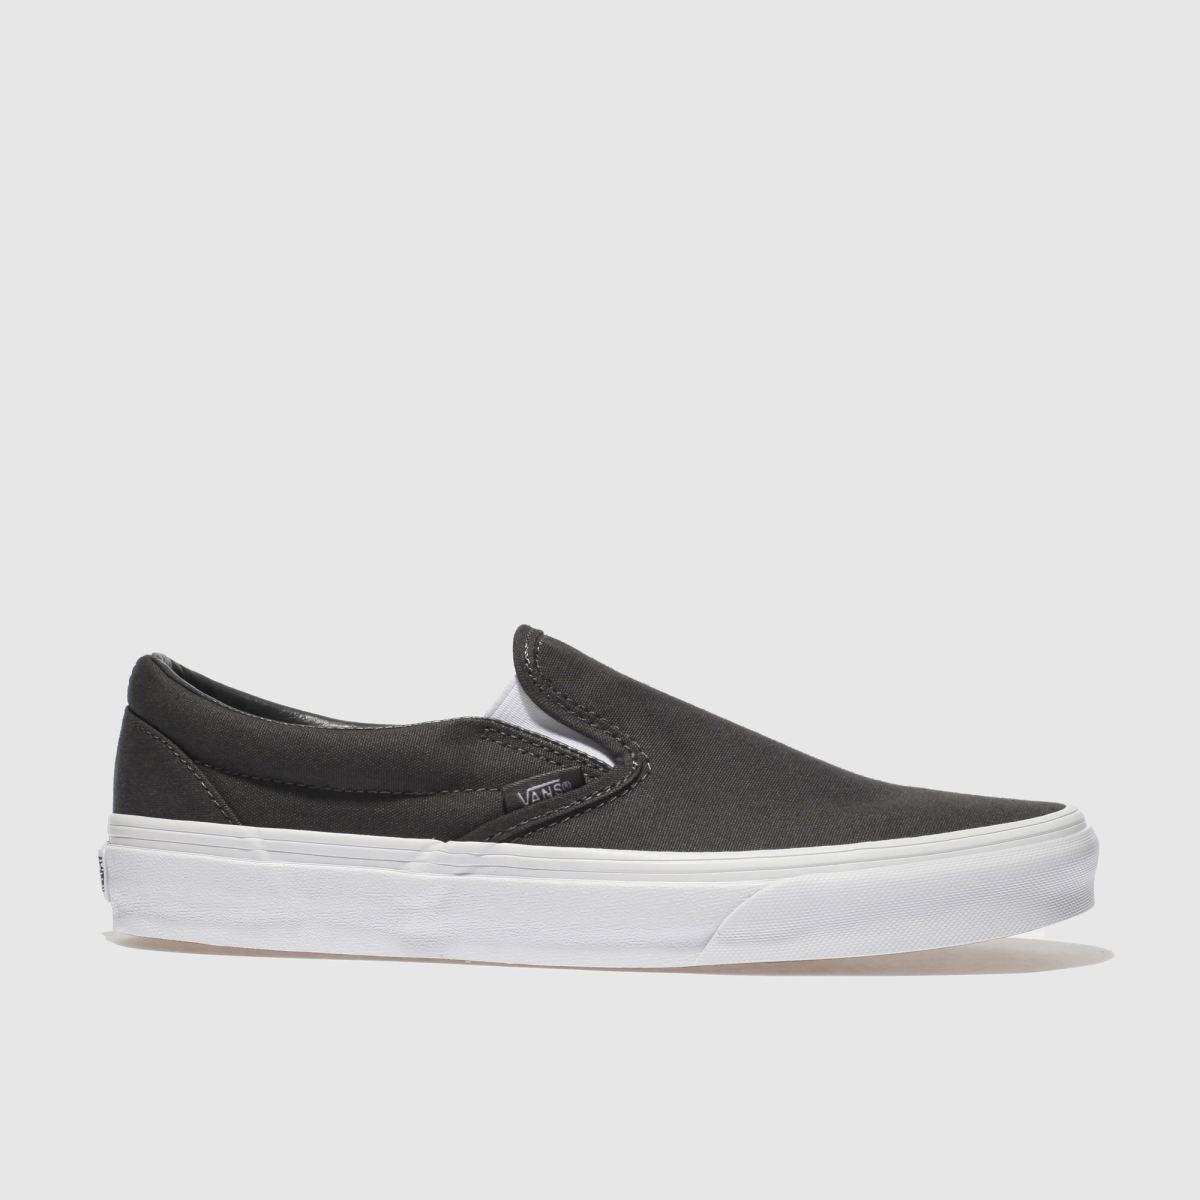 Vans Dark Grey Classic Slip-on Trainers